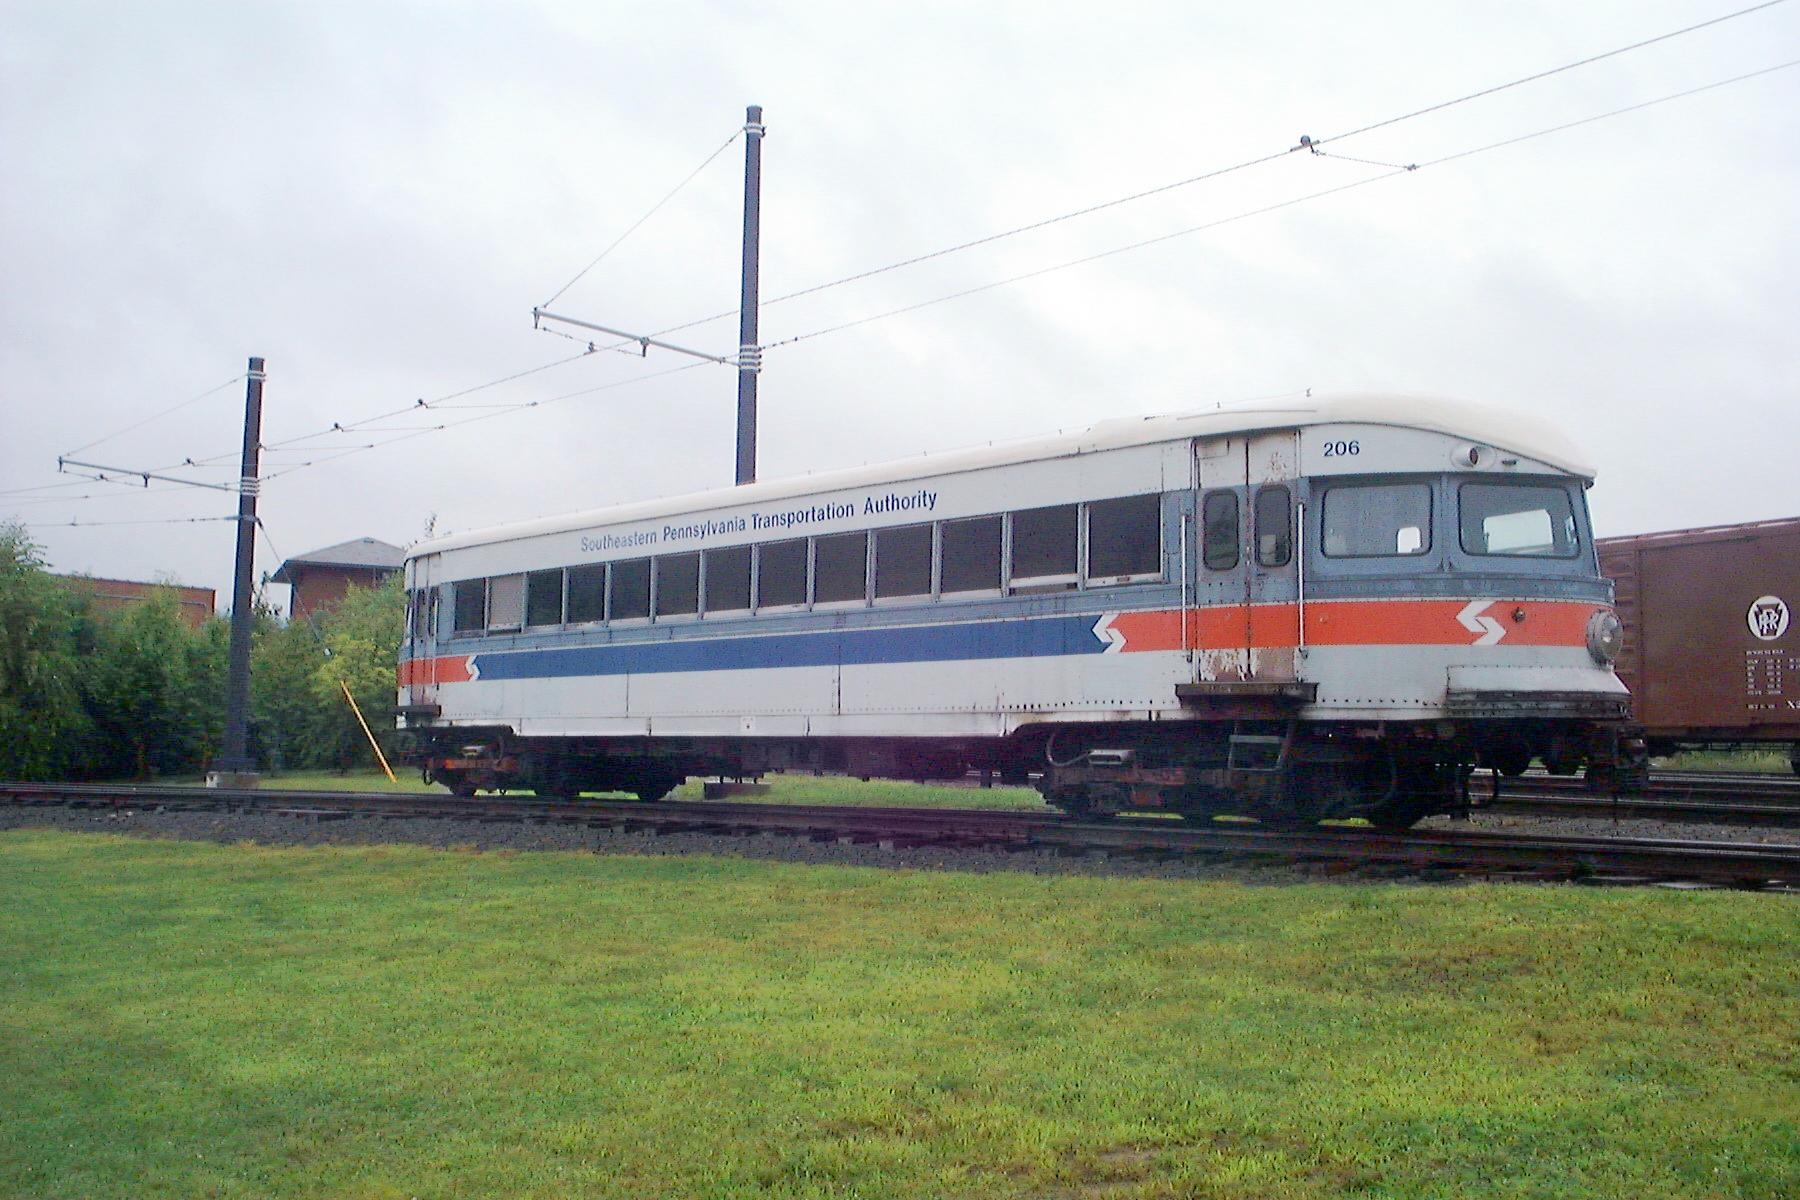 philadelphia & western railway 206.jpg